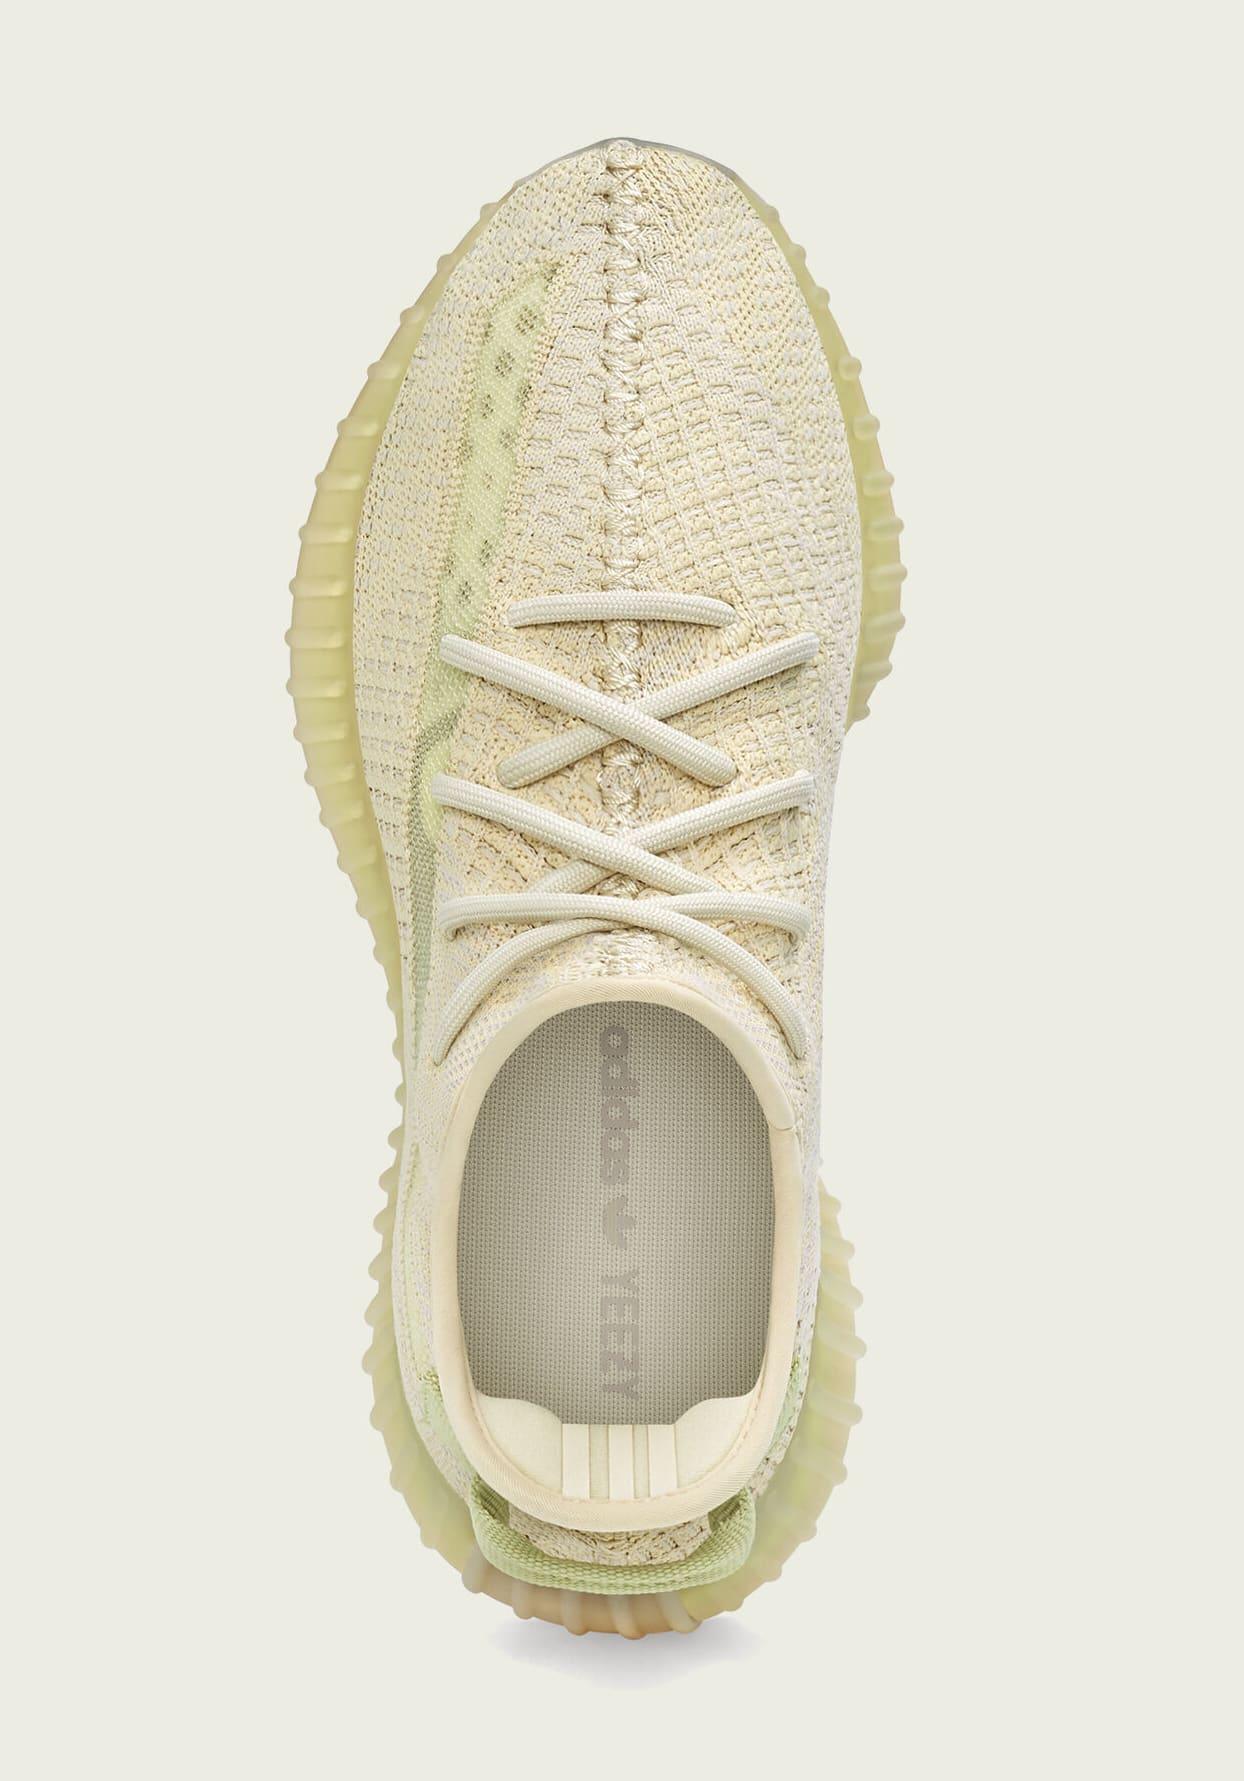 adidas-yeezy-boost-350-v2-flax-fx9028-top